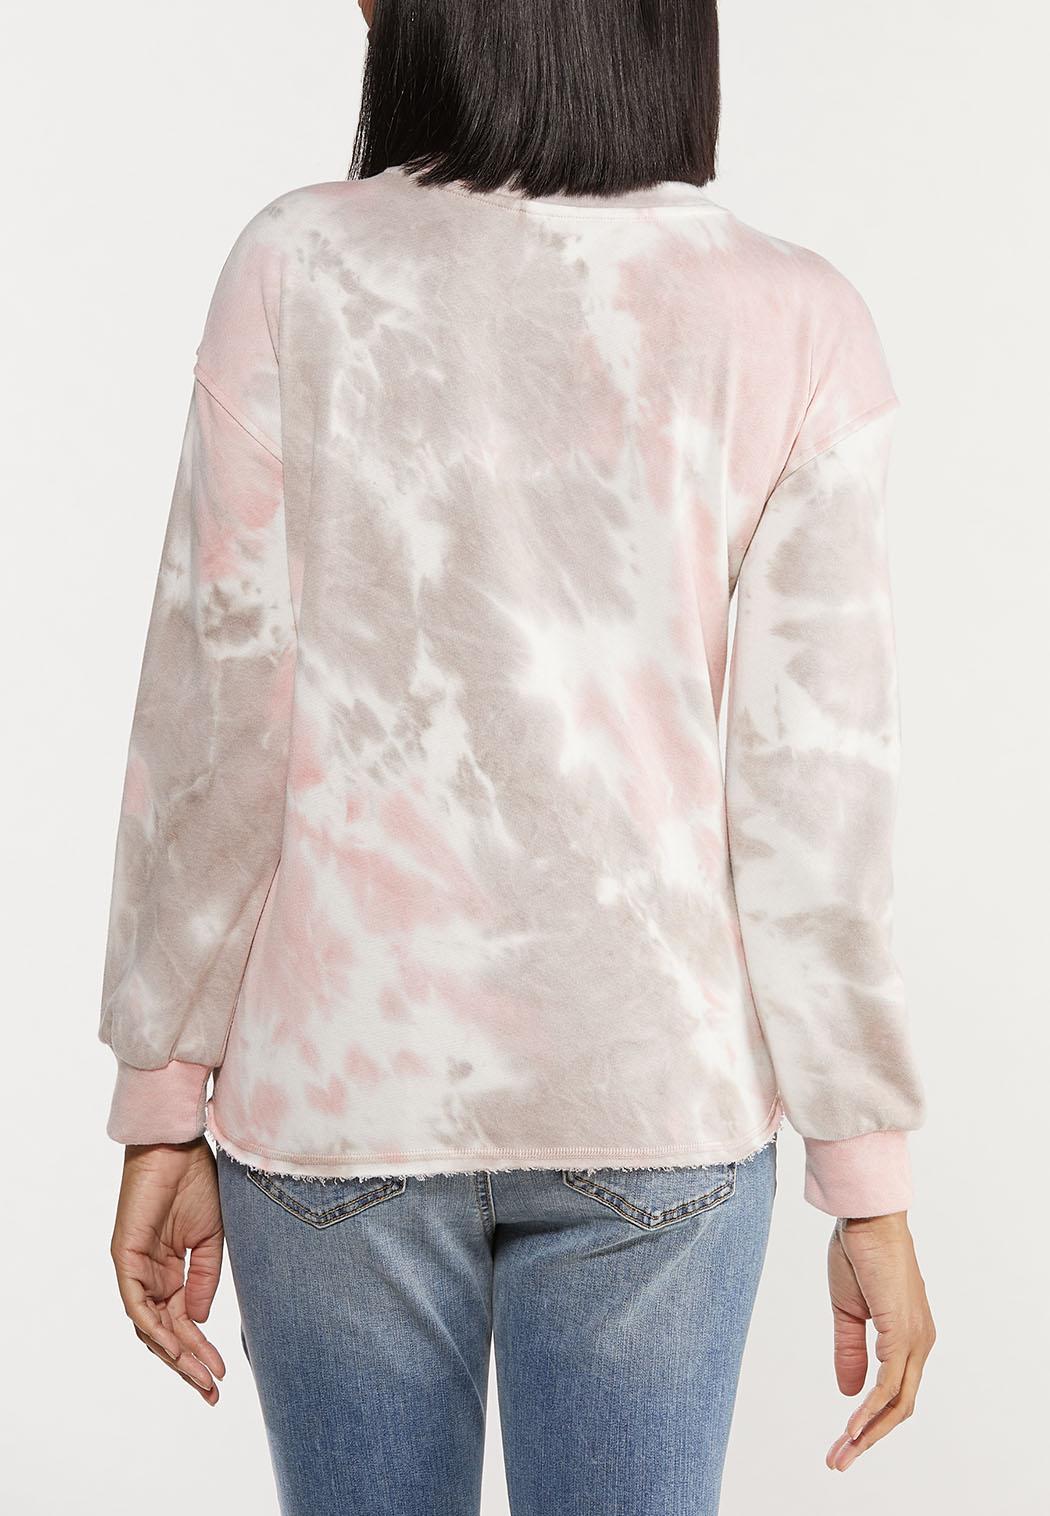 Plus Size Distressed Tie Dye Sweatshirt (Item #44563165)